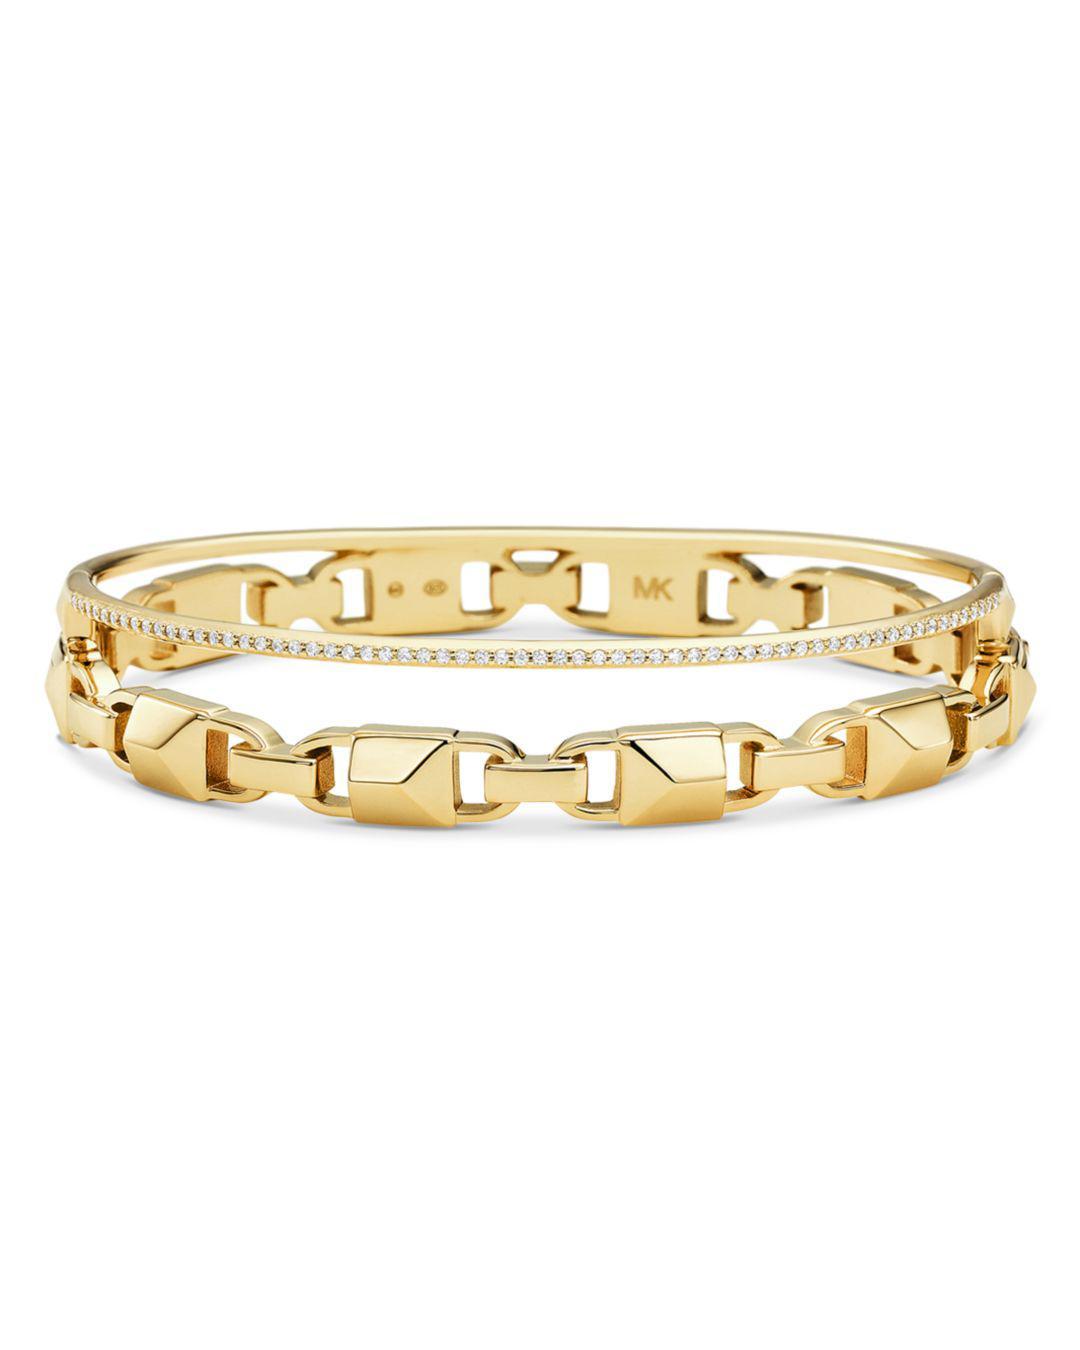 d702a5a6abdf Lyst - Michael Kors Pavé Link Hinge Bangle Bracelet in Metallic